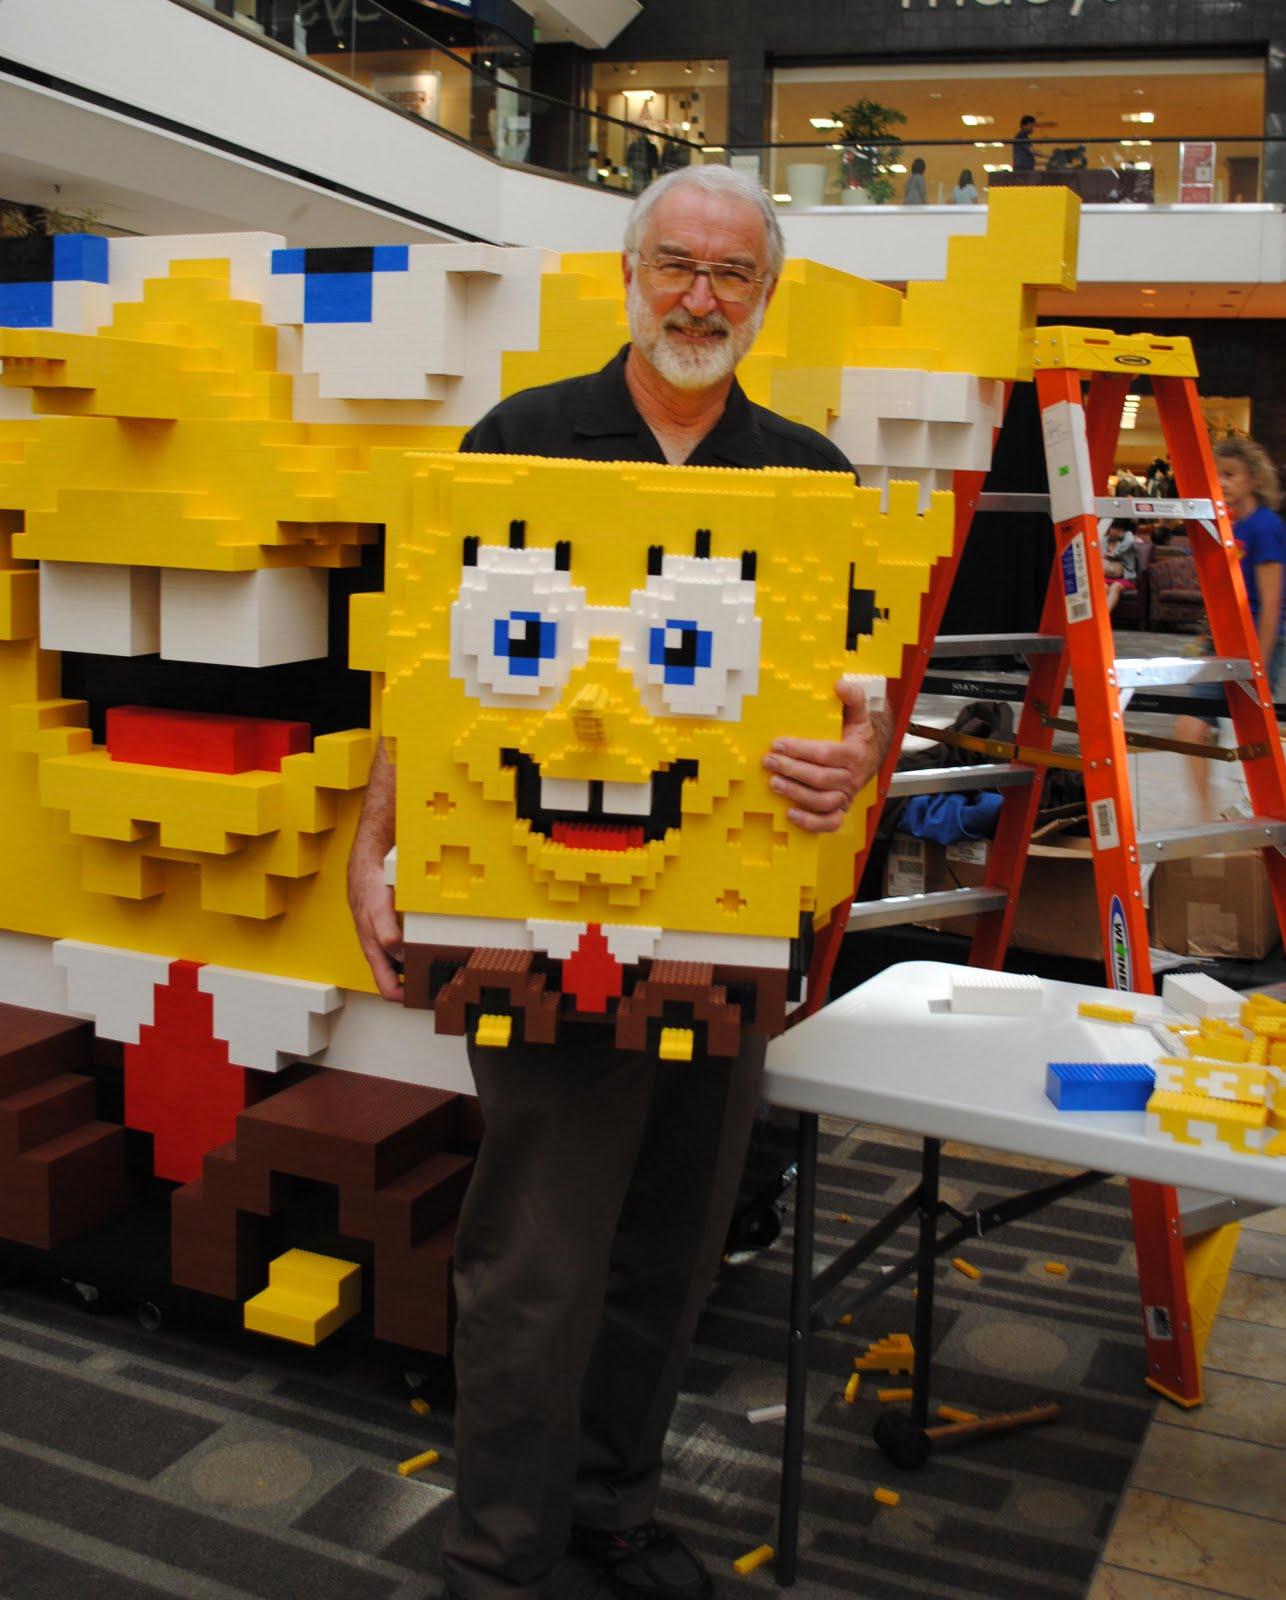 Master Builder Spongbob